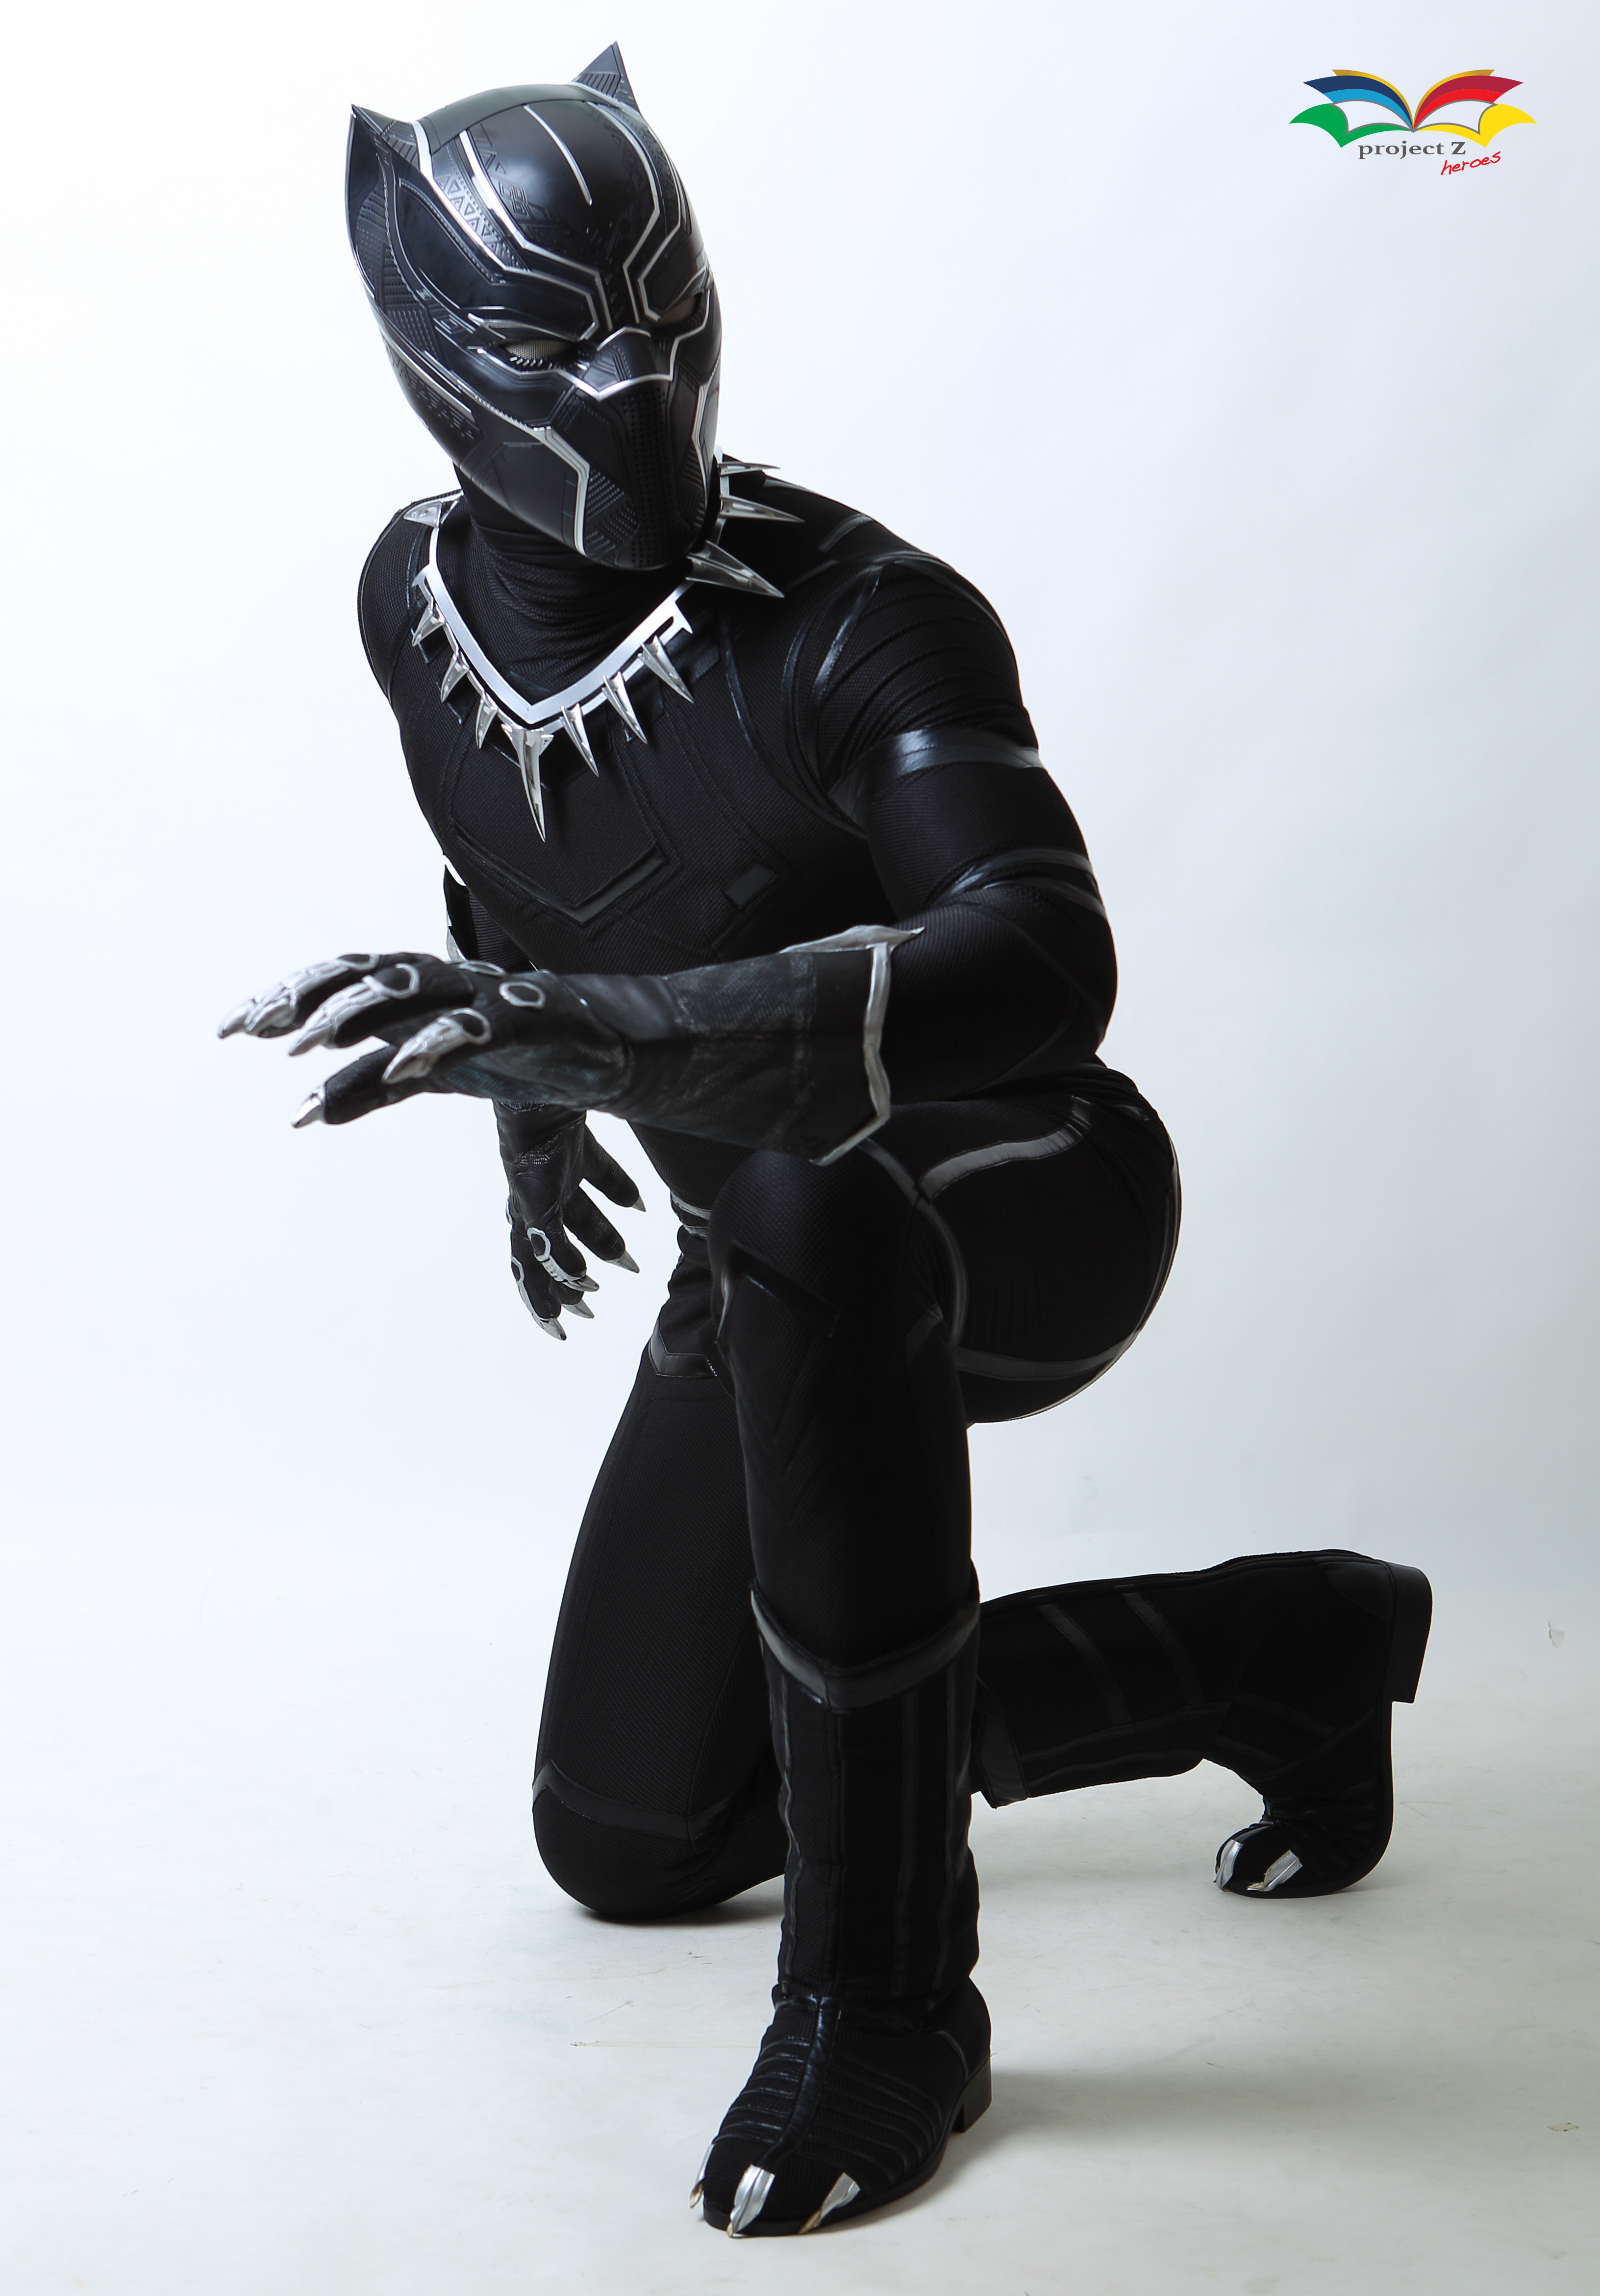 Black Panther costume sitting post fullbody